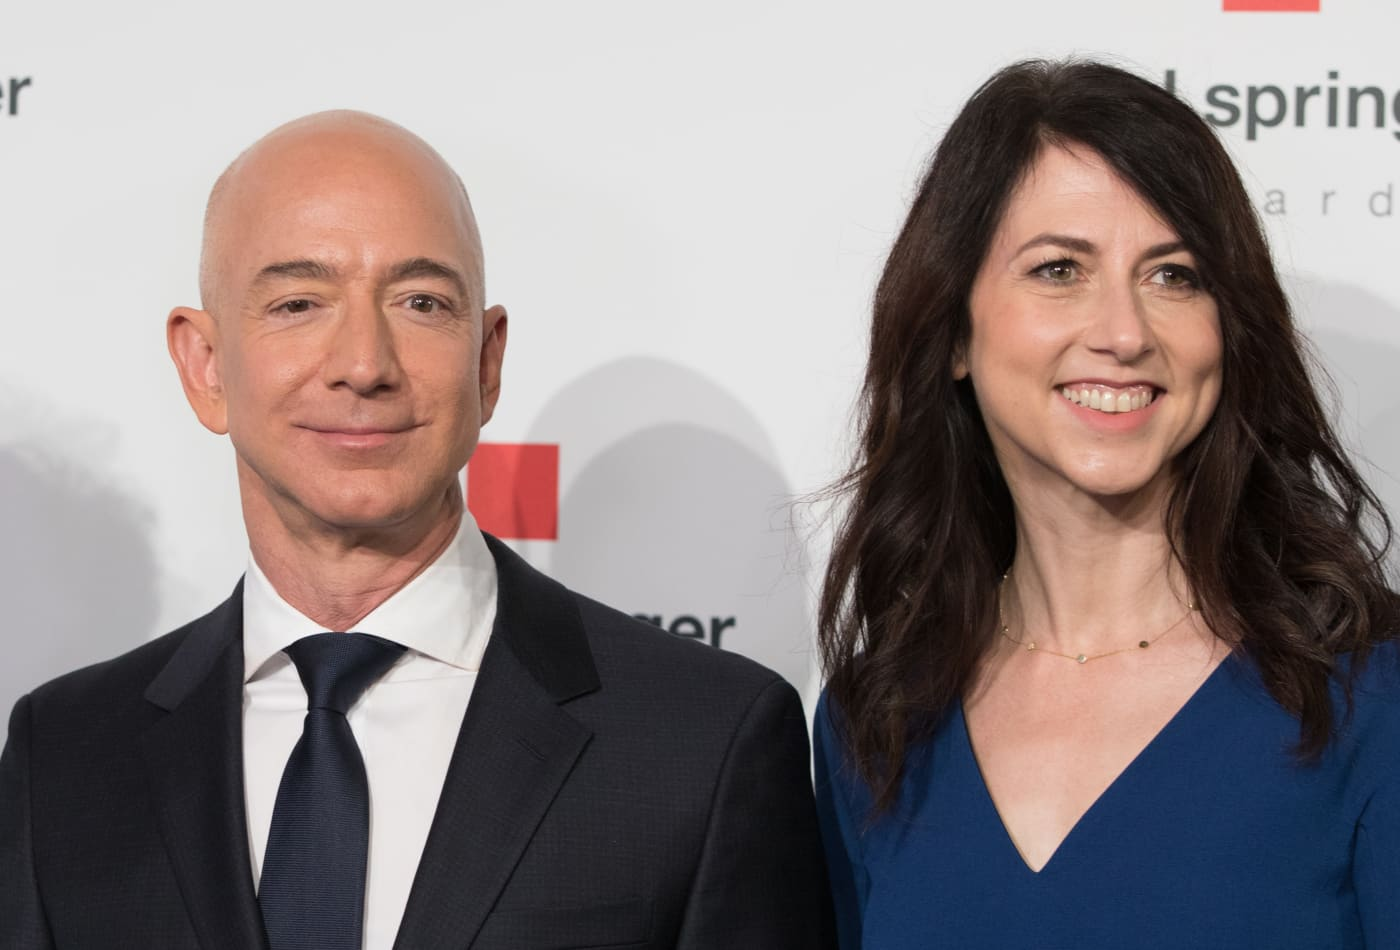 MacKenzie Bezos sells $400 million of her Amazon shares